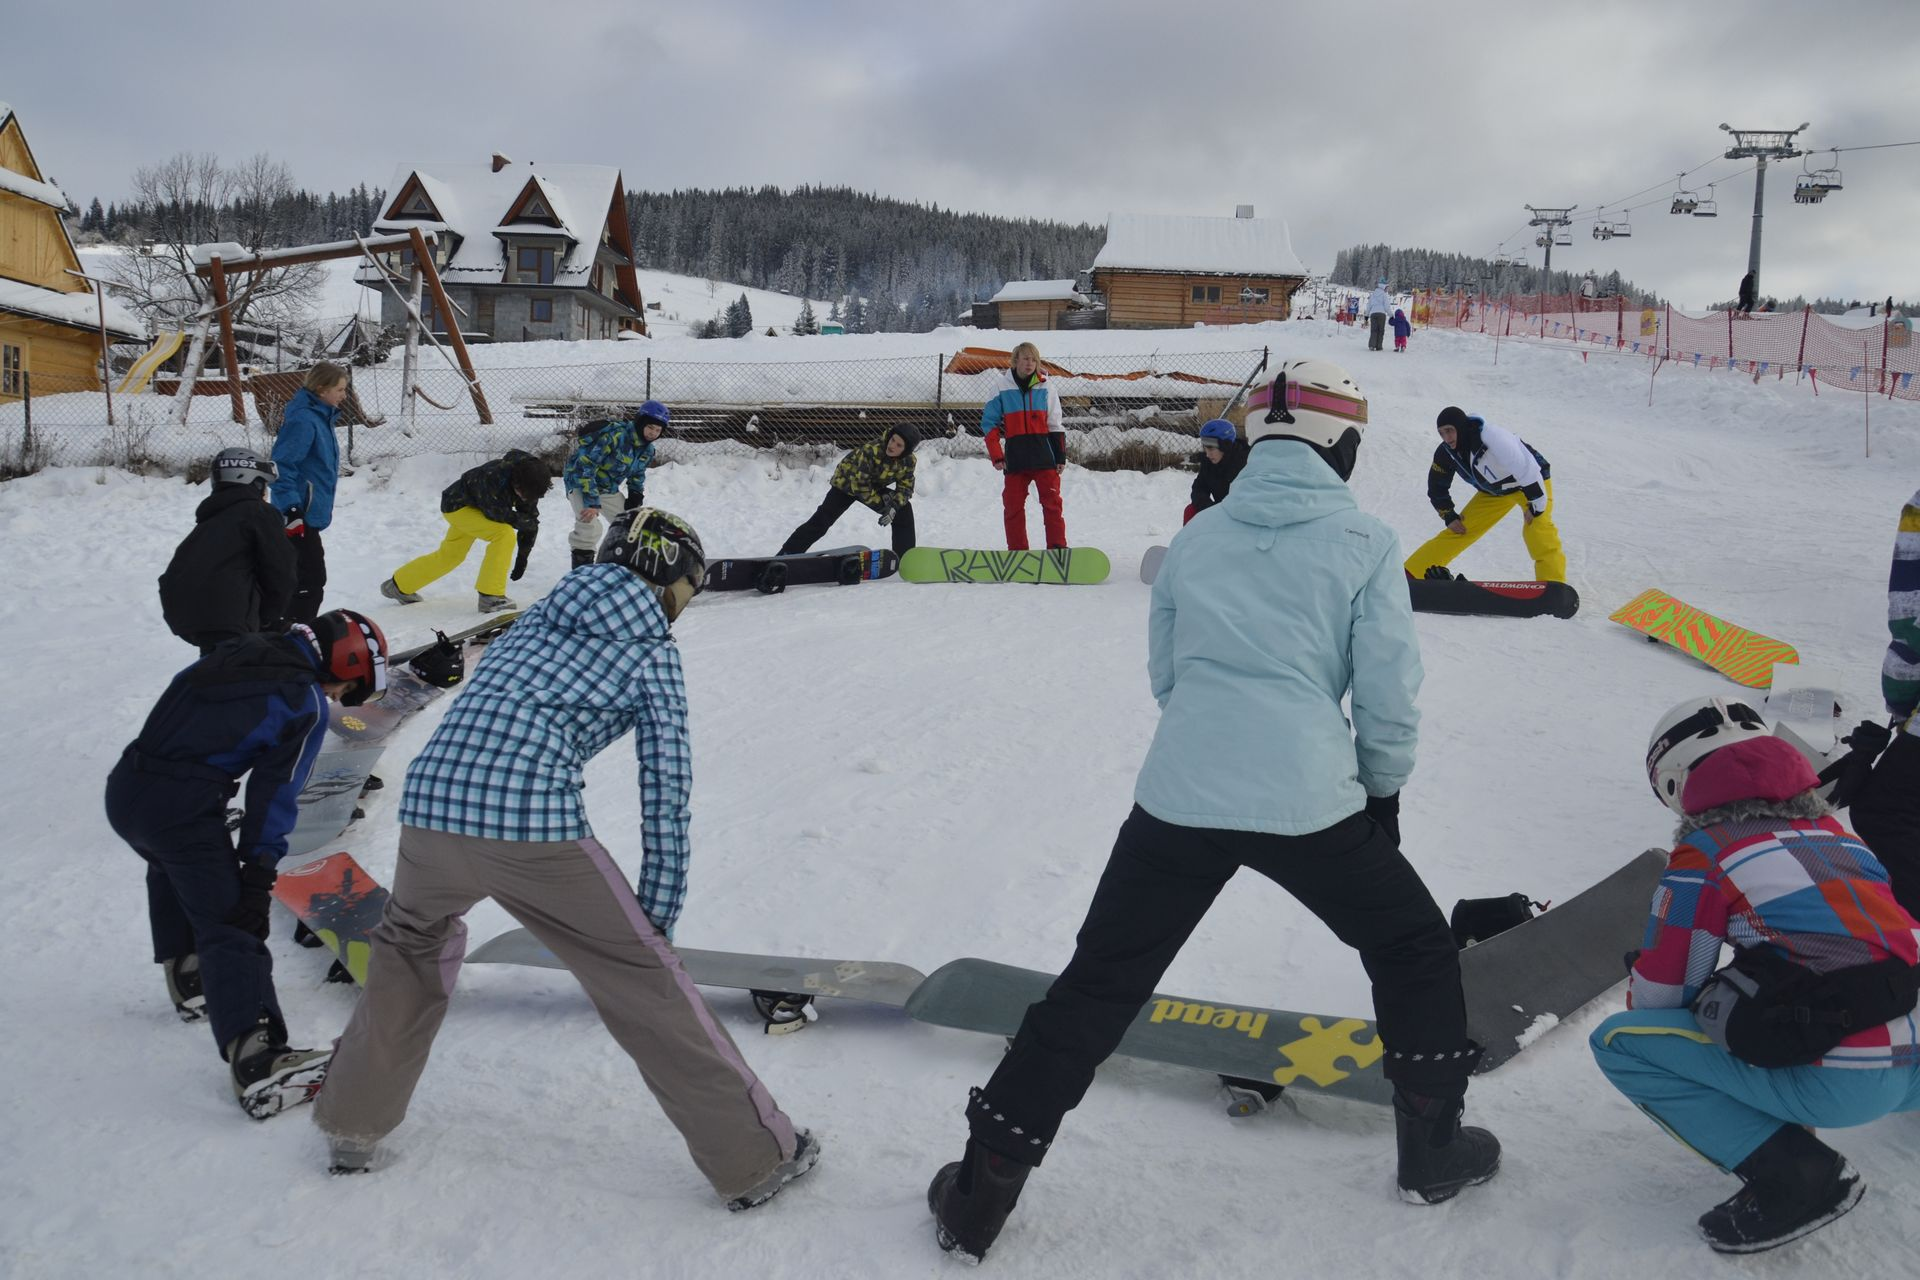 CarTourist_narty-snowboard_2013-foto-1